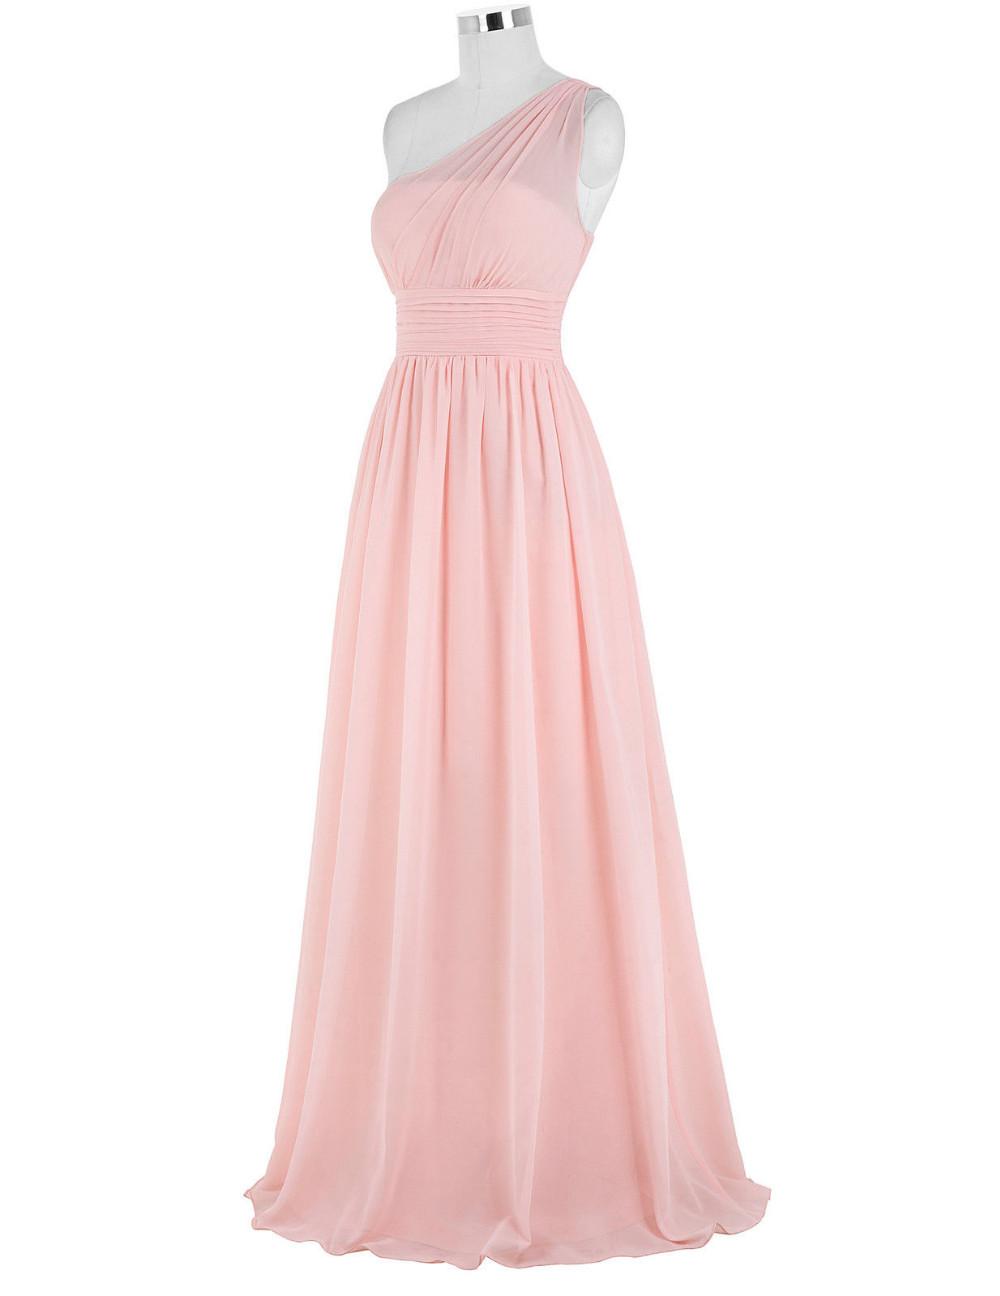 Kate Kasin Mint Green Bridesmaid Dresses Long Wedding Party Dresses One Shouler Bruidsmeisjes Jurk Pink Bridemaid Dress 0200 11